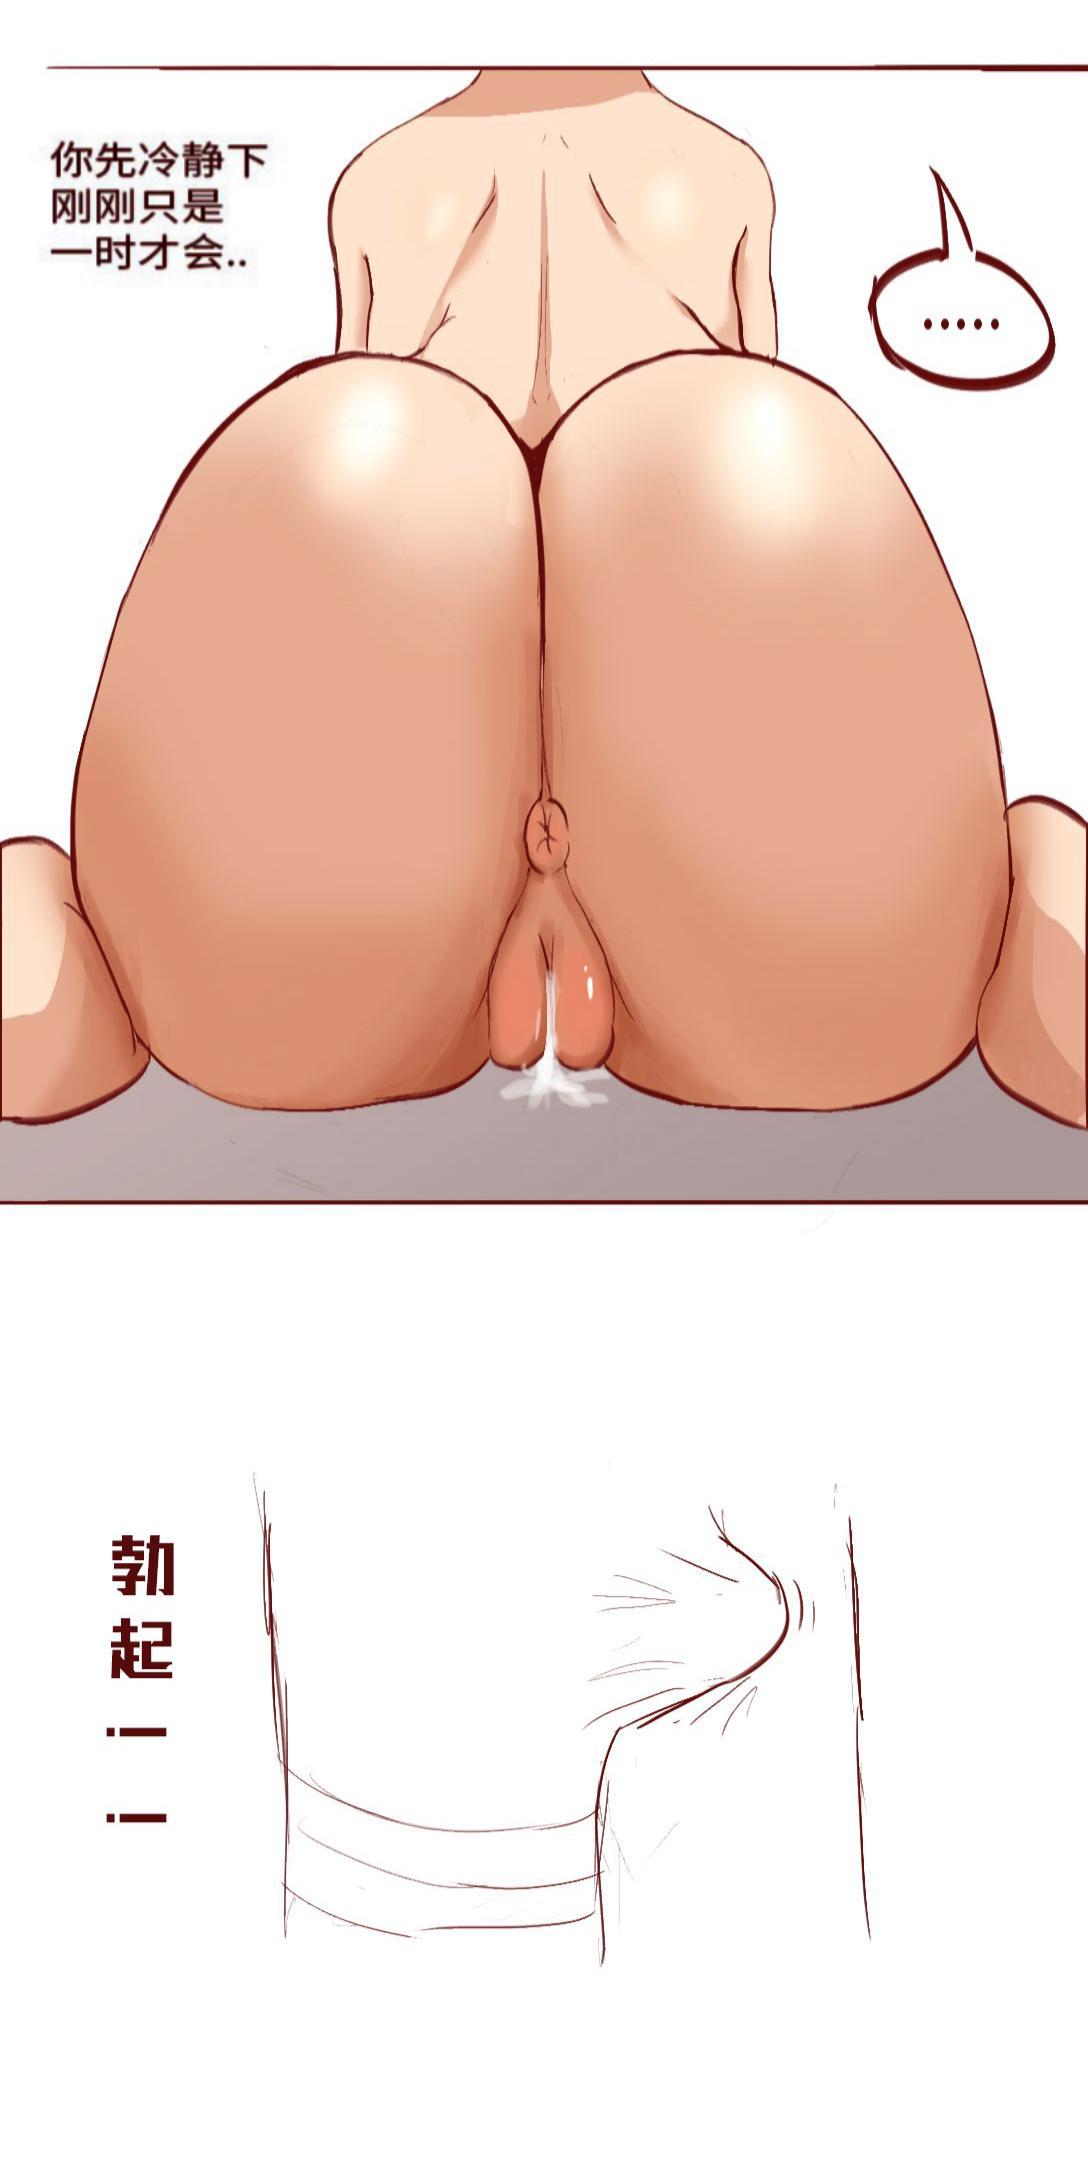 Naruto NTR 引牛入室(雏田 ) 18